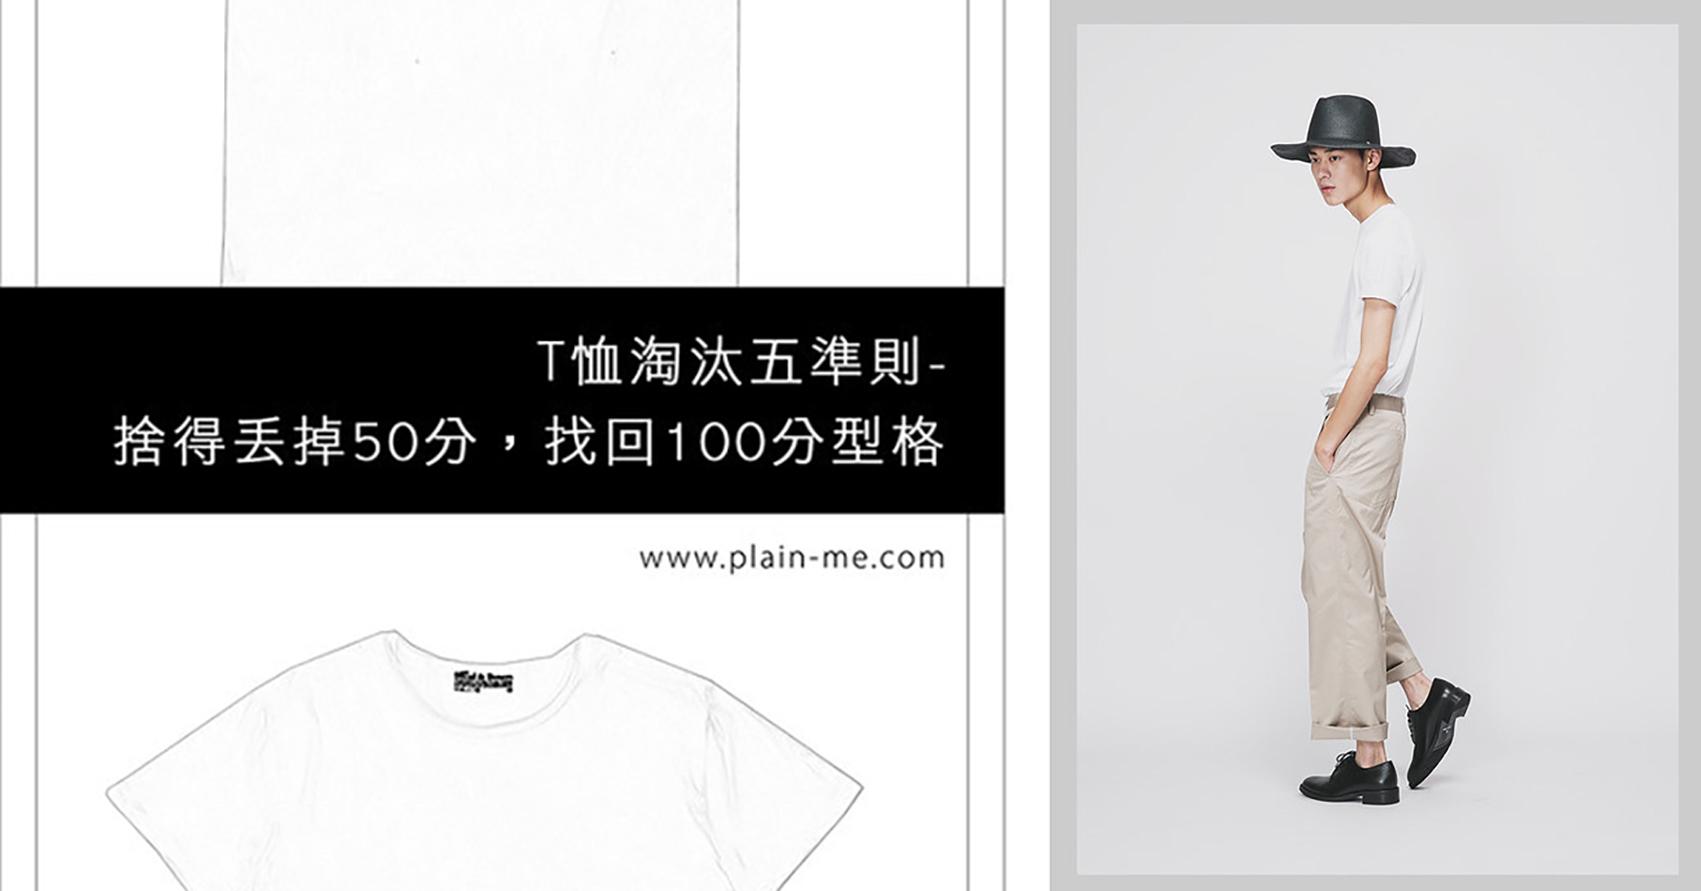 t恤,素T,素T穿搭,白T,T-shirt,T-shirt 穿搭,T-shirt 穿搭 男,T-shirt 穿搭 女,t恤 穿搭,淘汰,淘汰準則,T恤淘汰